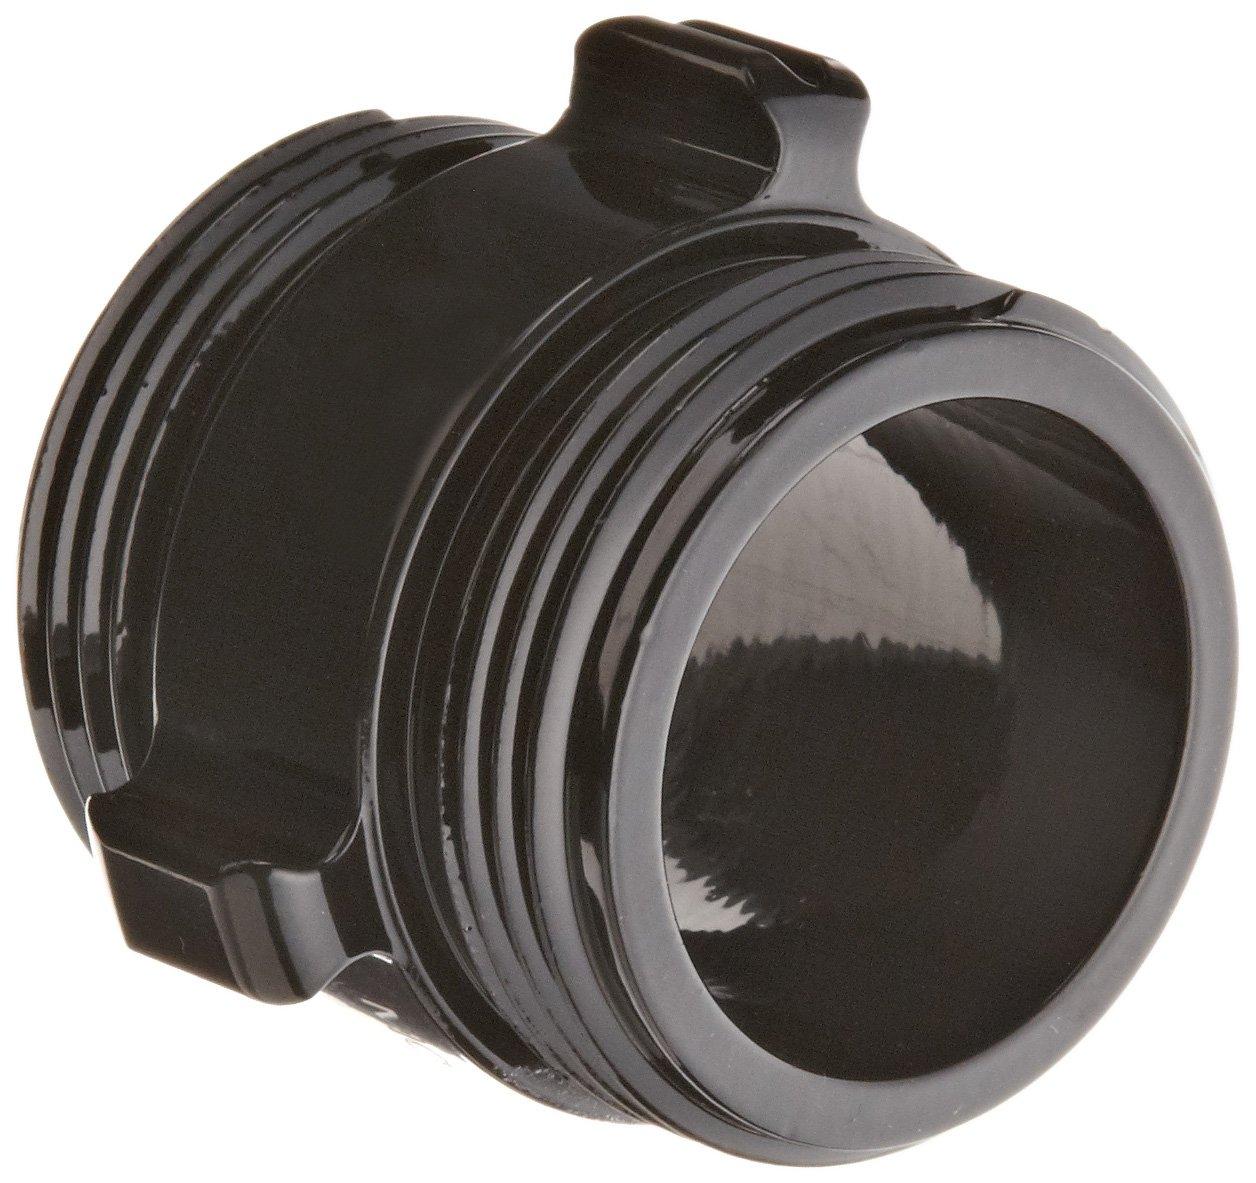 Moon 378-1521524 Aluminum Fire Hose Adapter, Rocker Lug, 1-1/2'' NH x 1-1/2'' NH Double RL Male